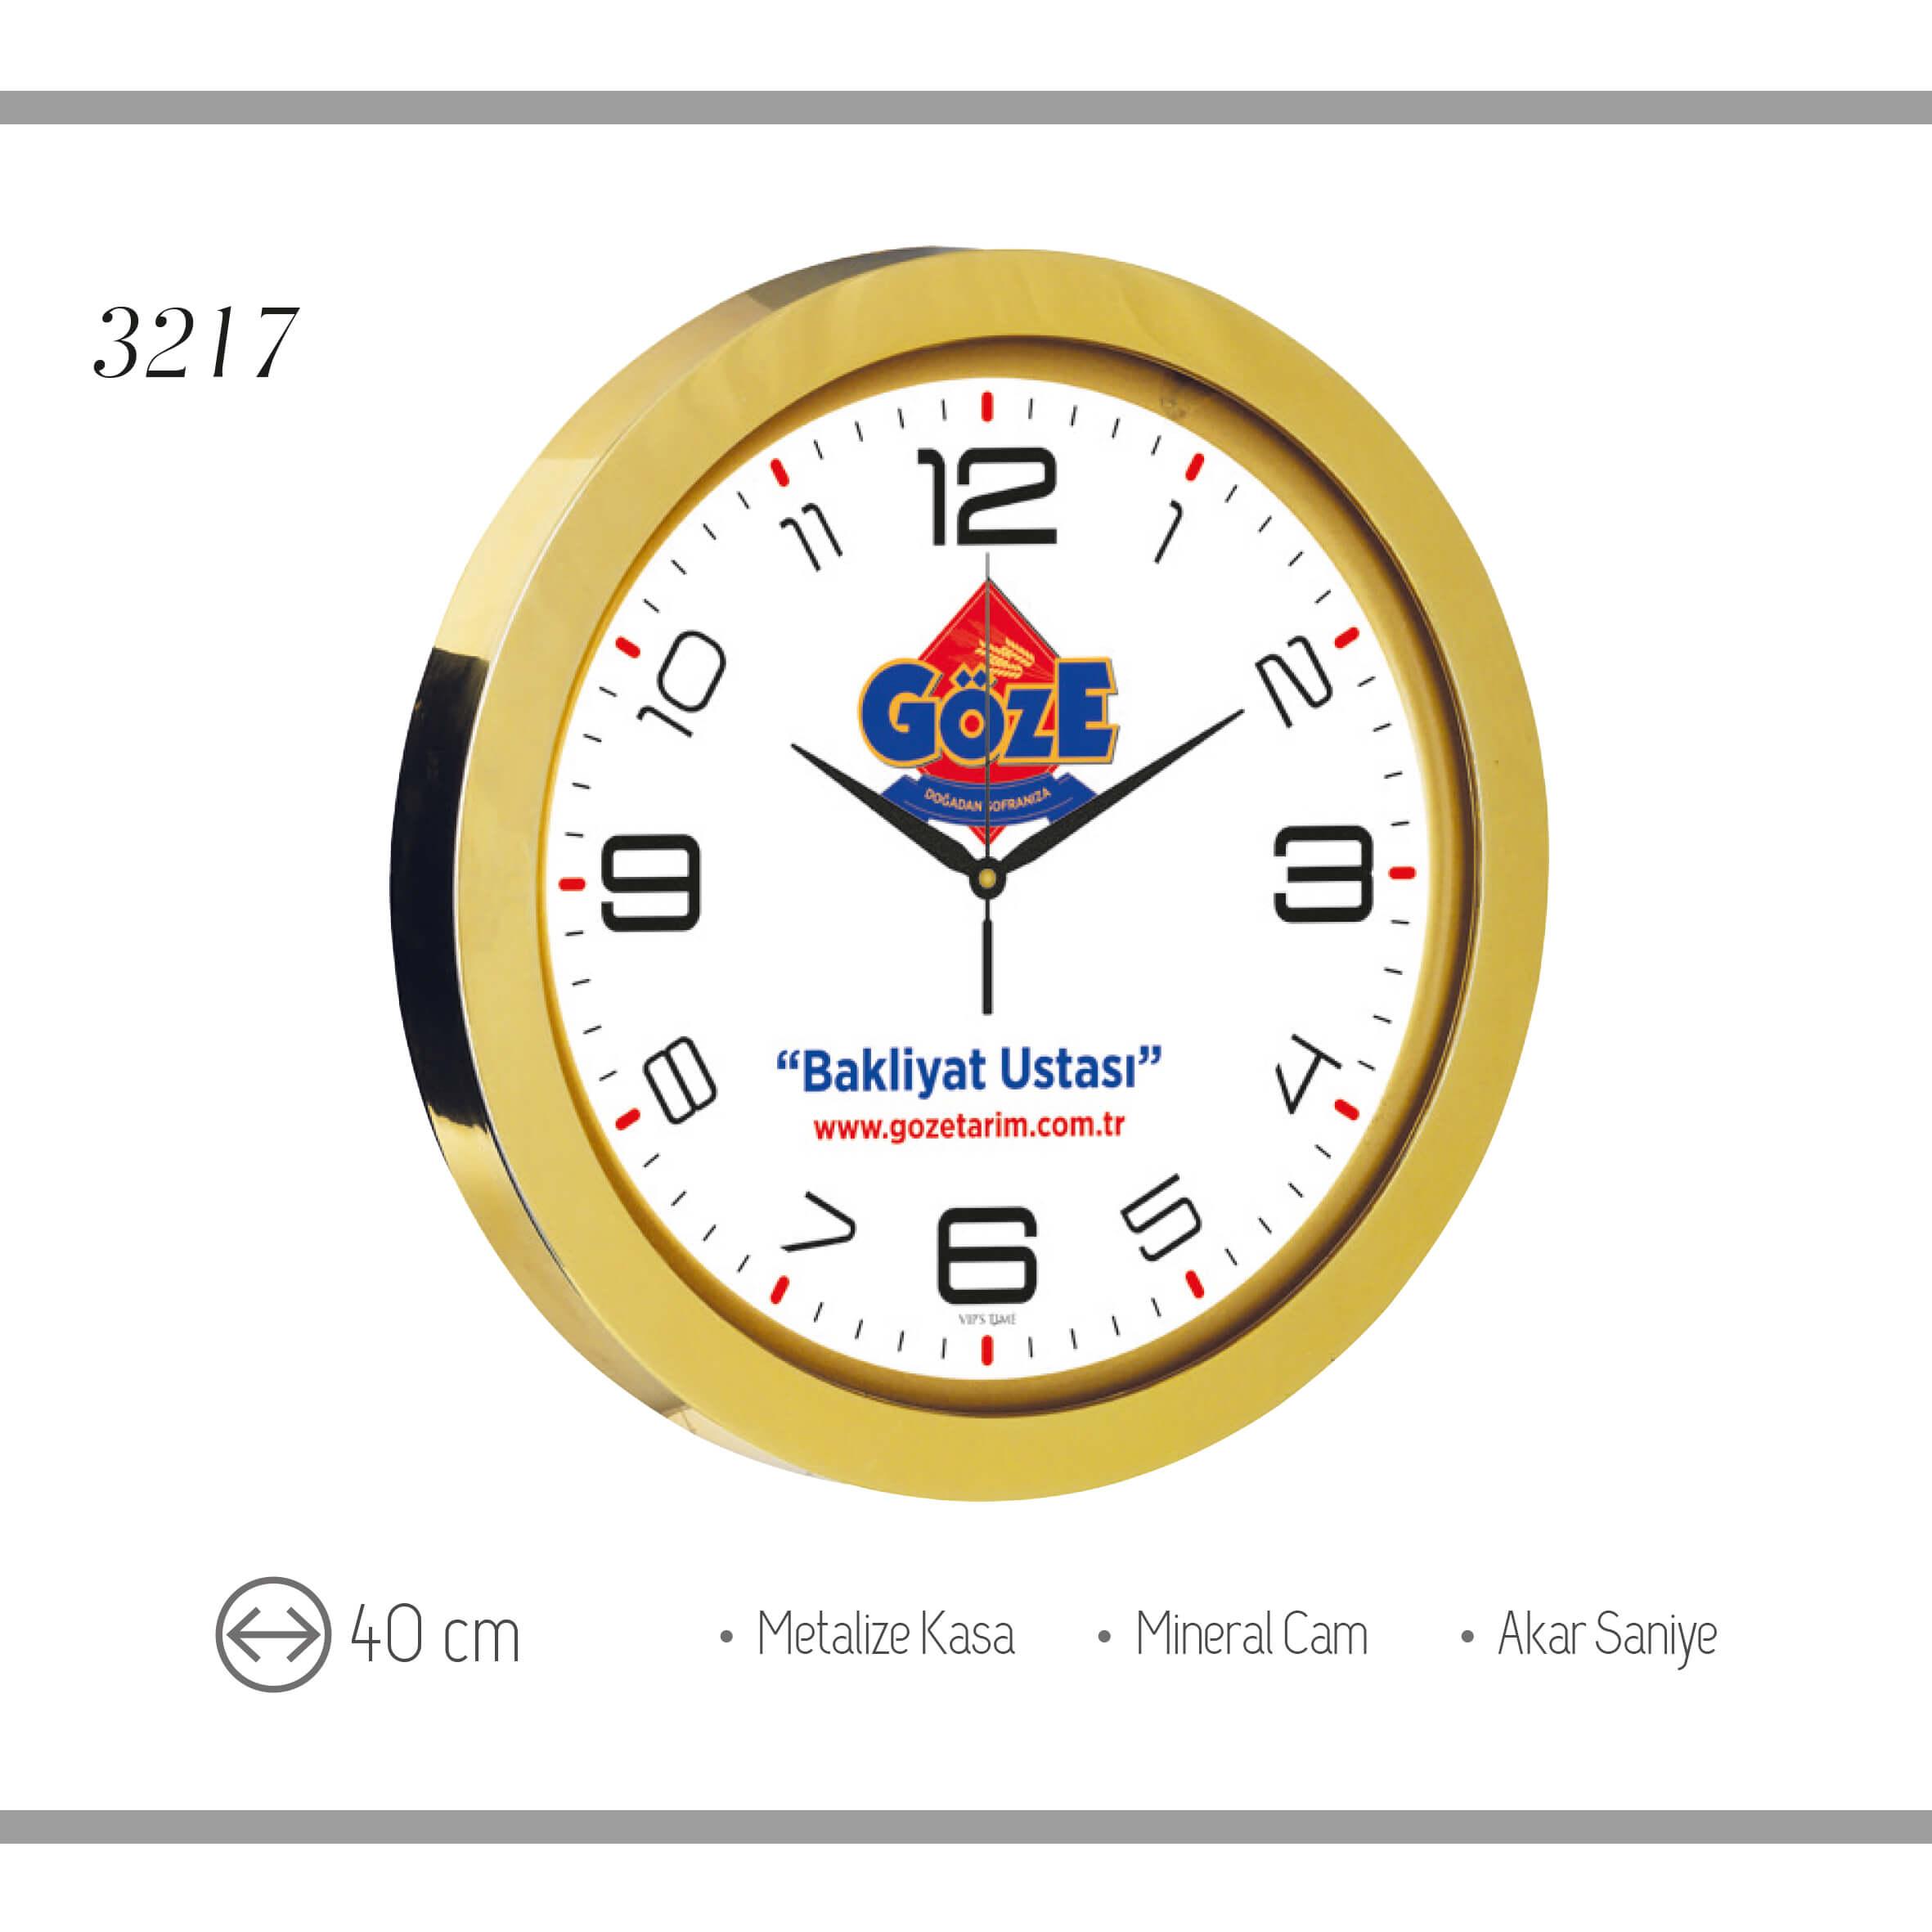 promosyon-promosyon ürünleri-promosyon saatler-duvar saatleri-promosyon duvar saati 3217